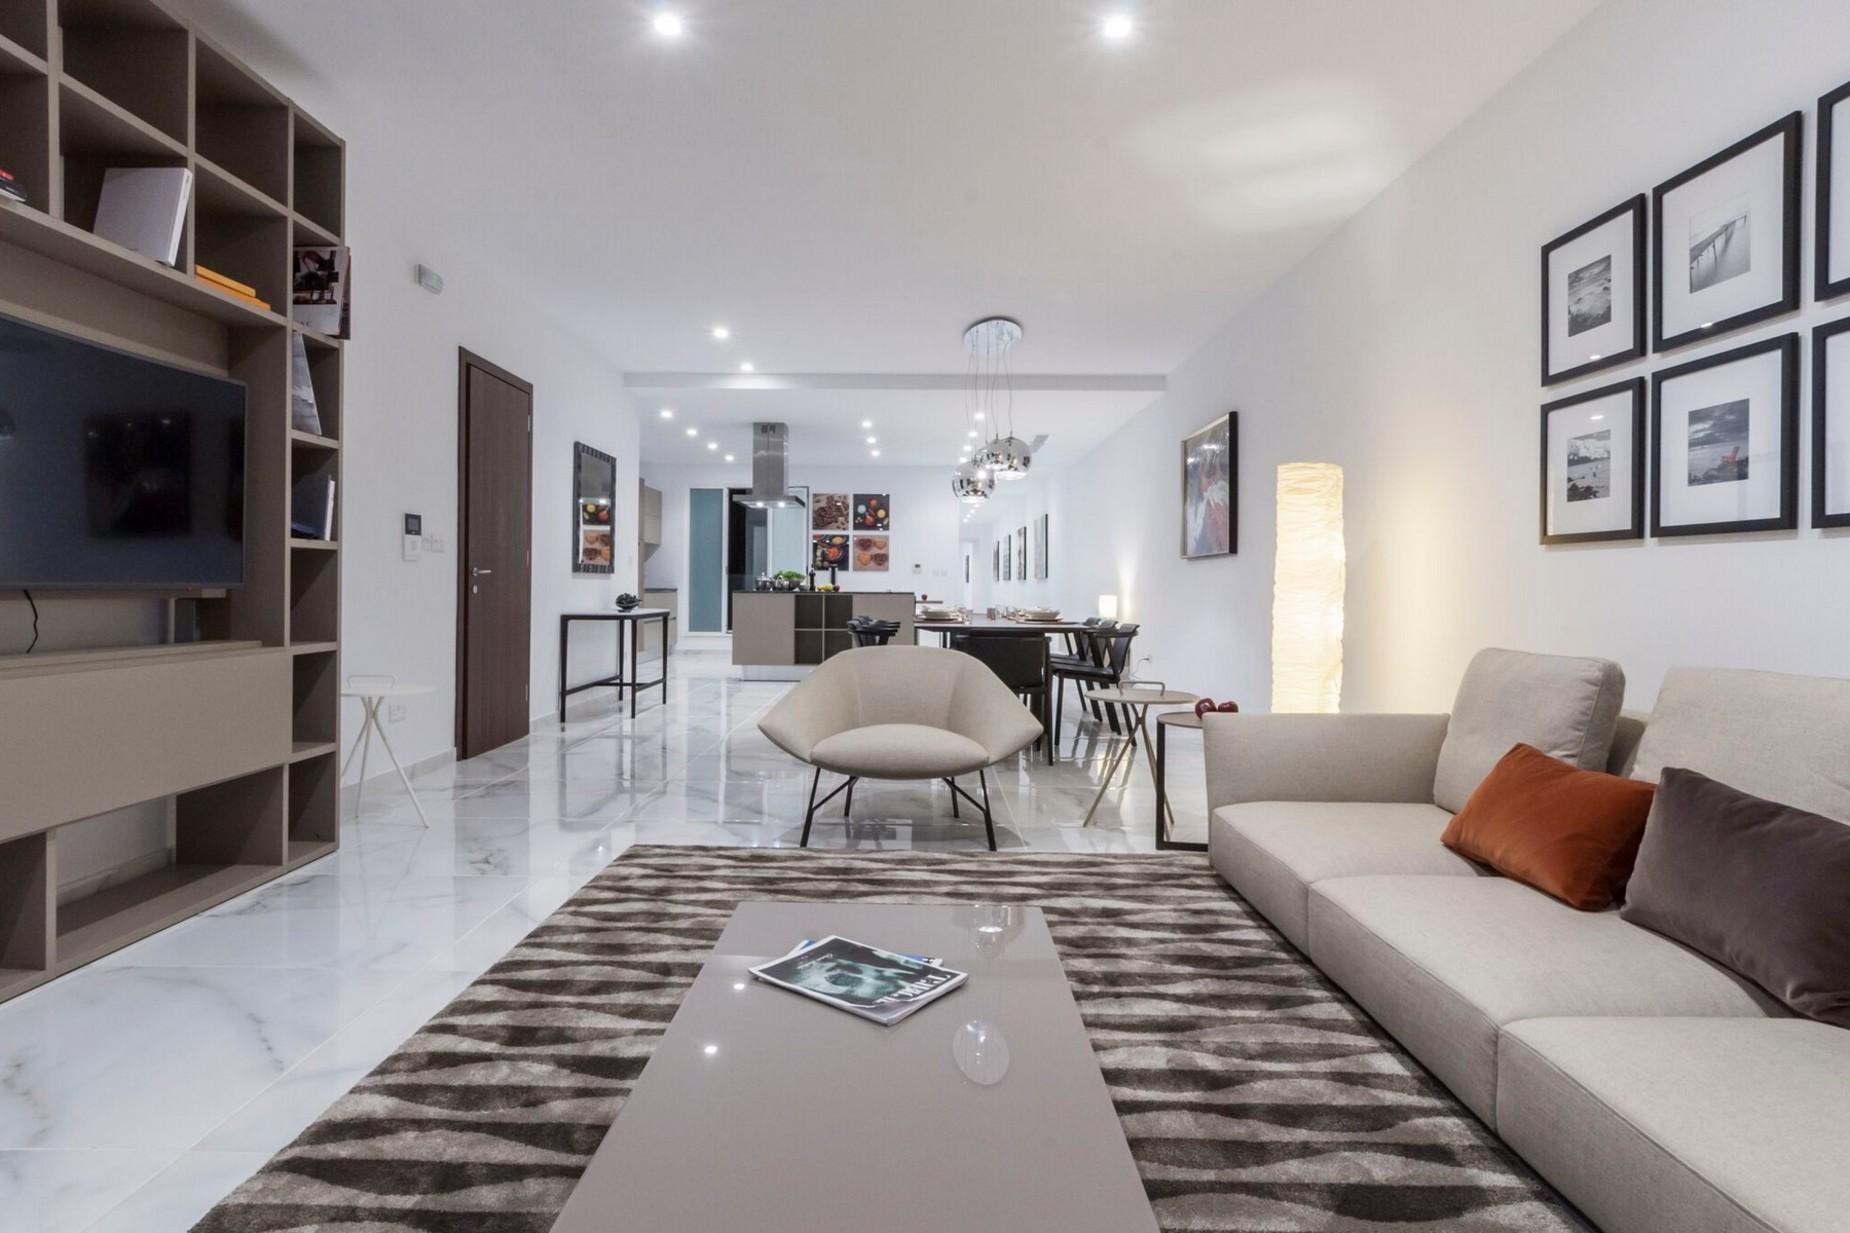 0 bed Apartment For Rent in Sliema, Sliema - thumb 5